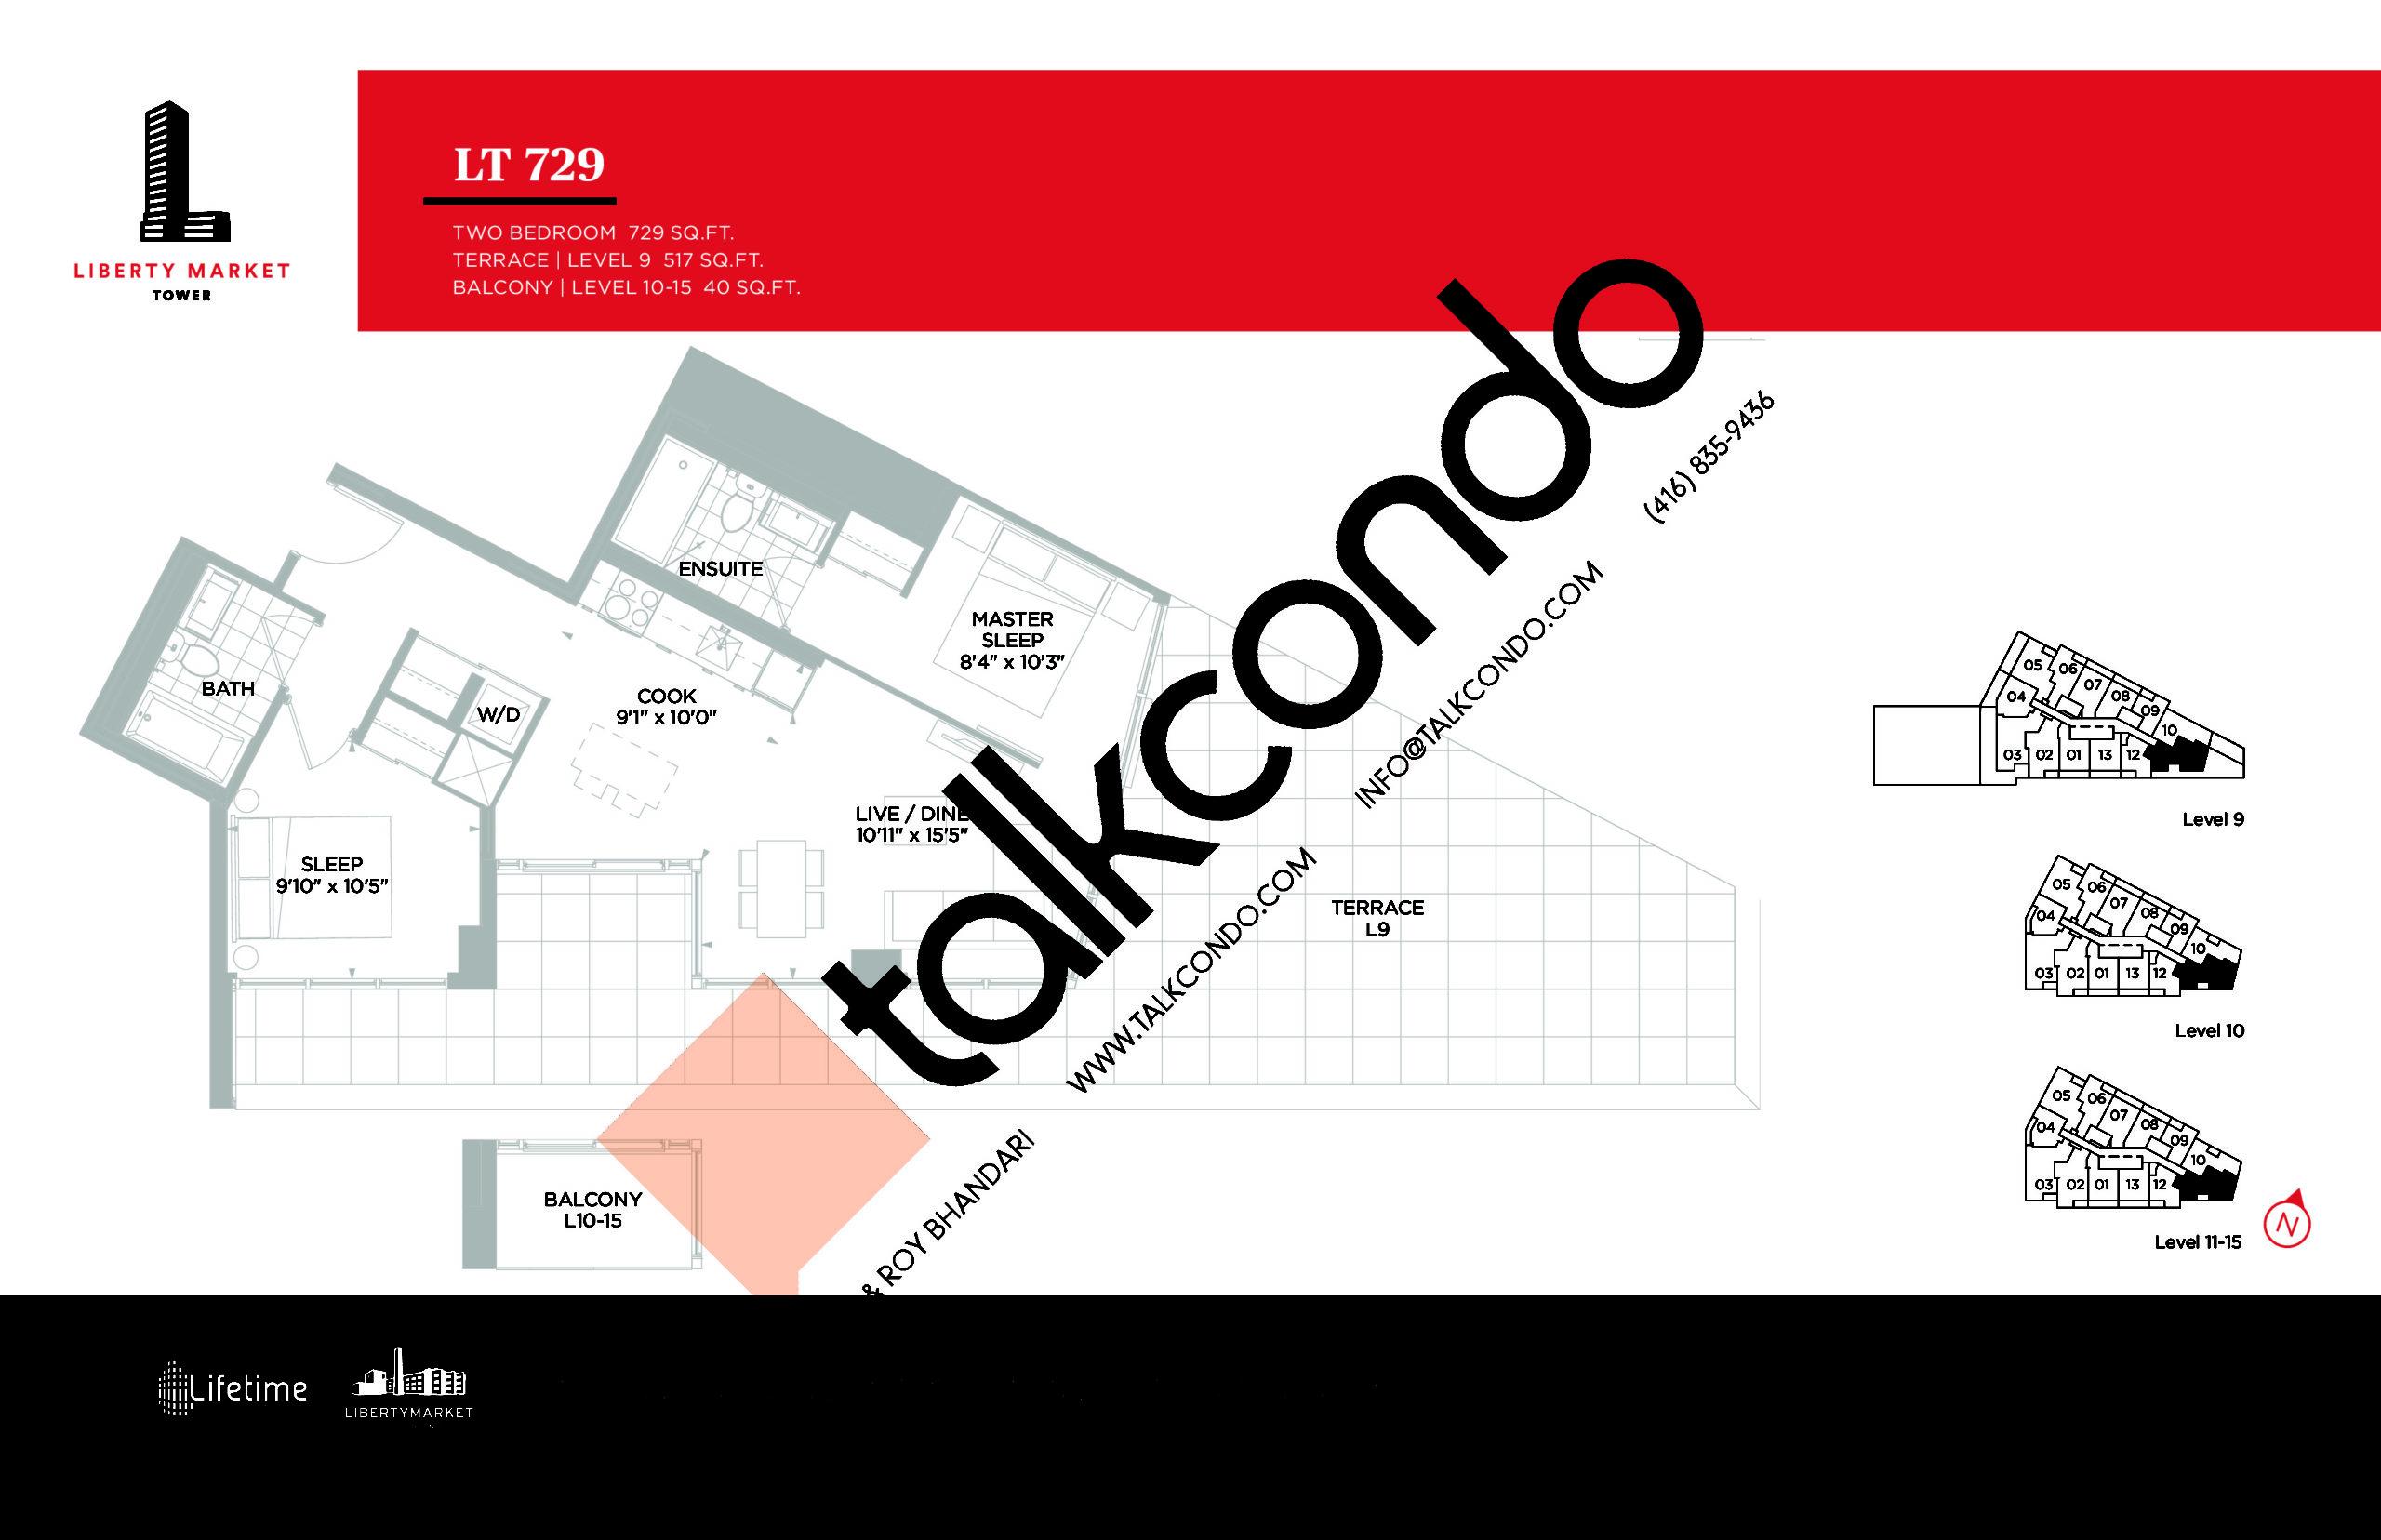 LT 729 Floor Plan at Liberty Market Tower Condos - 729 sq.ft